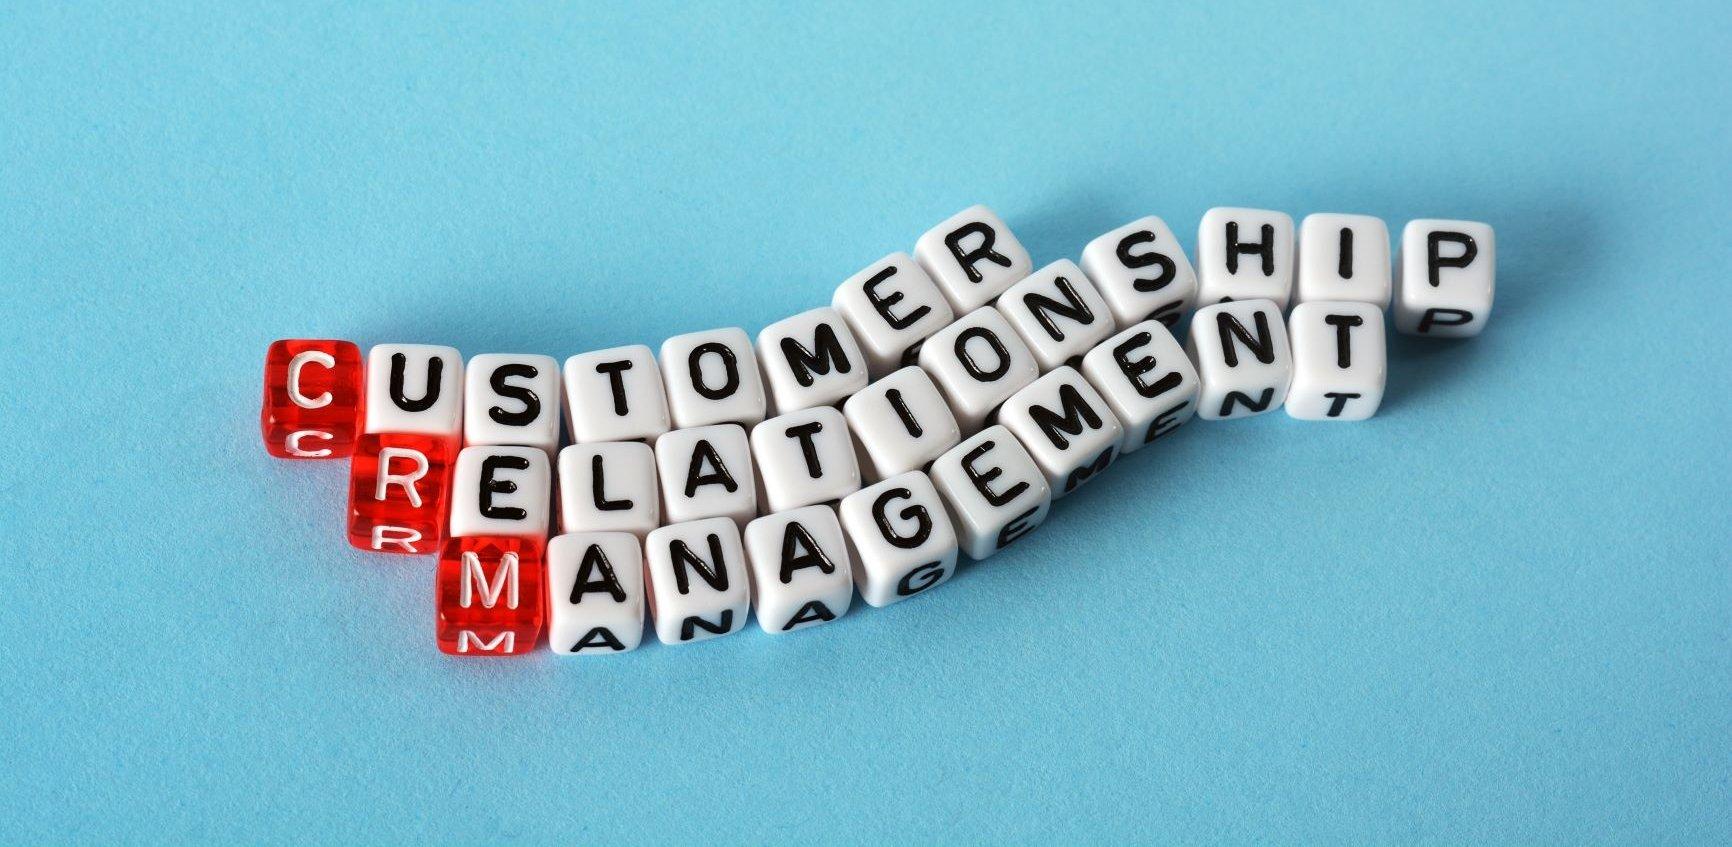 crm customer relationship